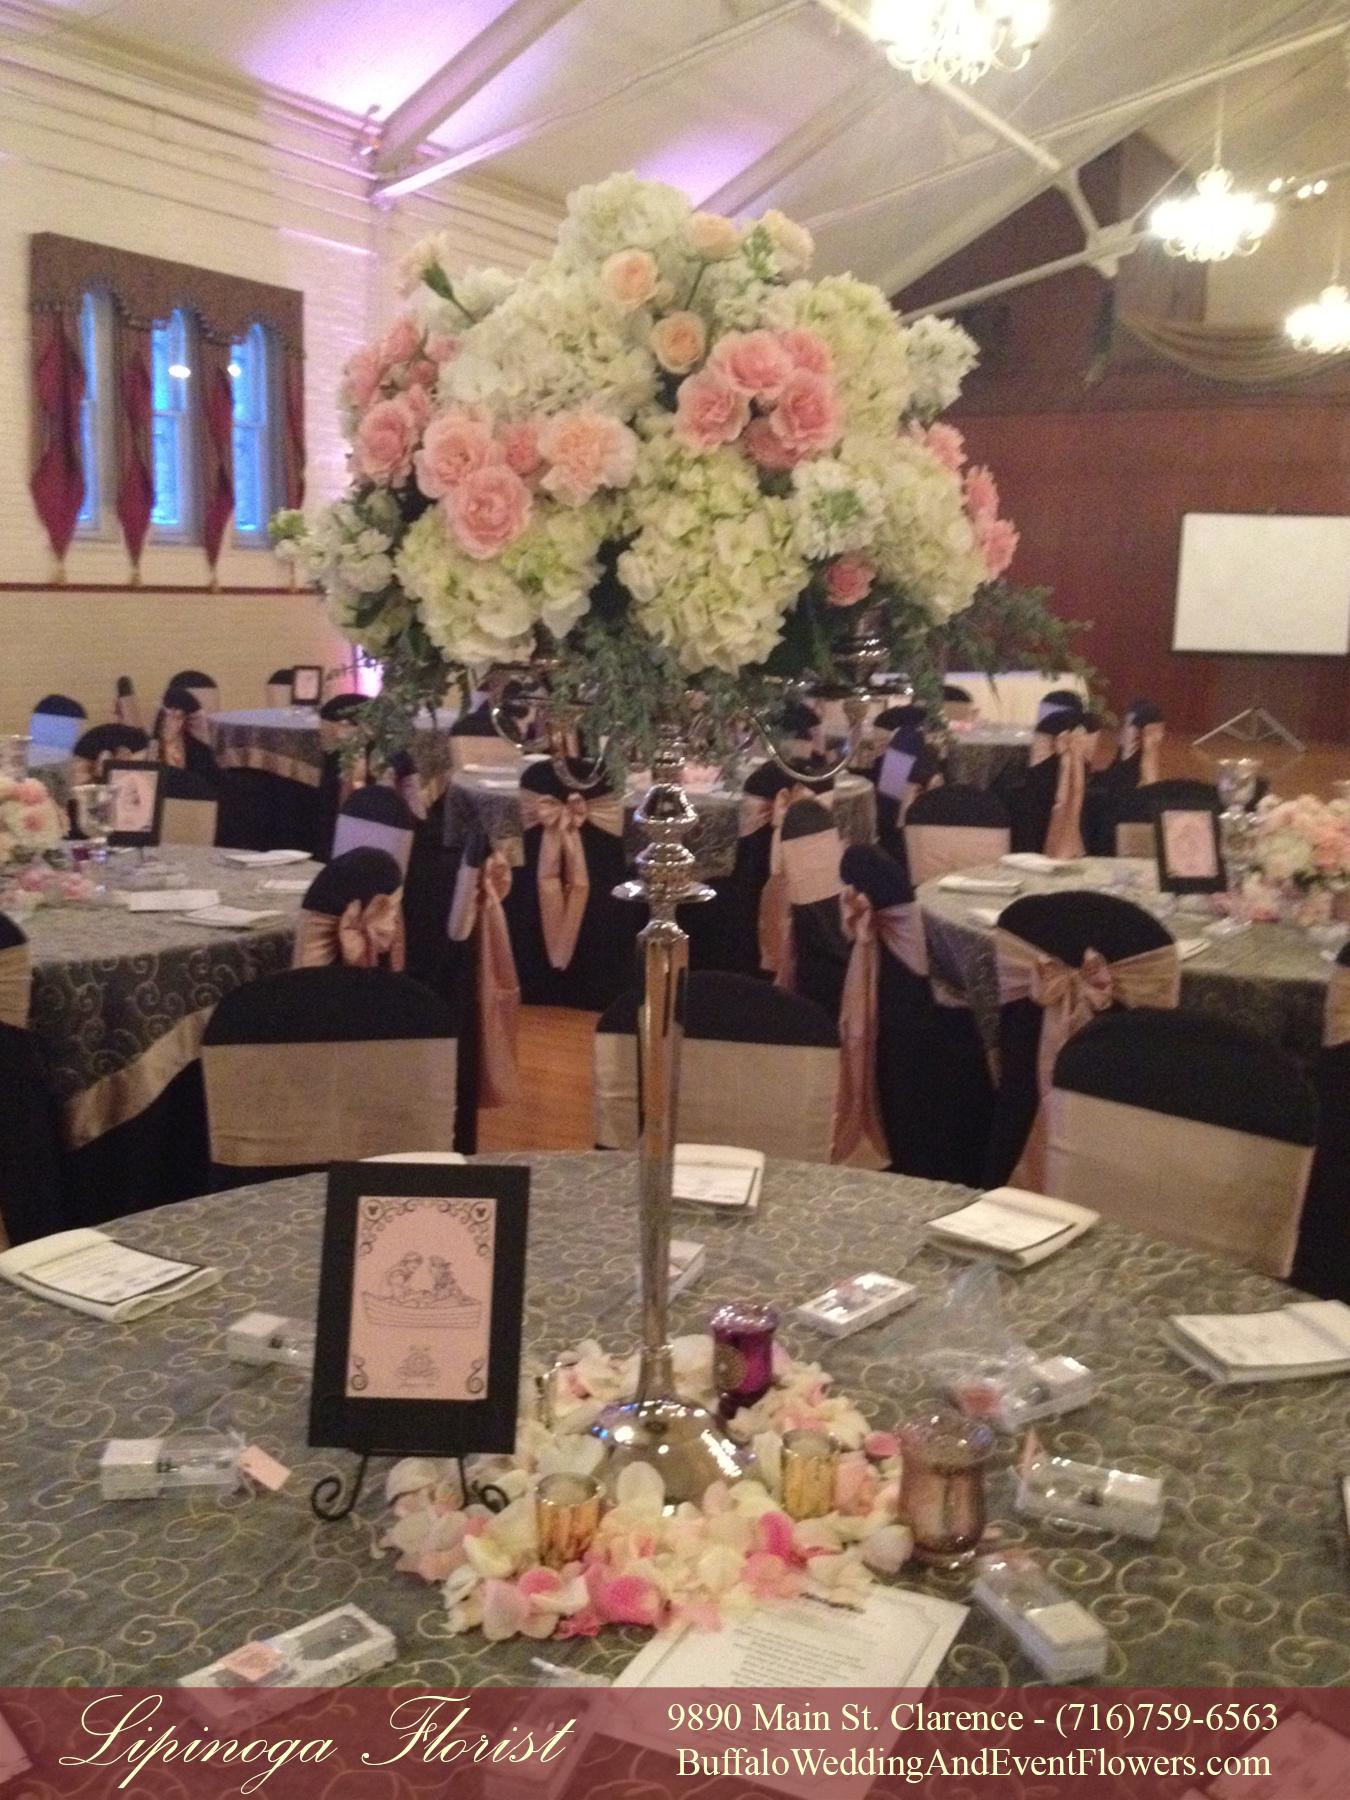 Pink buffalo wedding amp event flowers by lipinoga florist